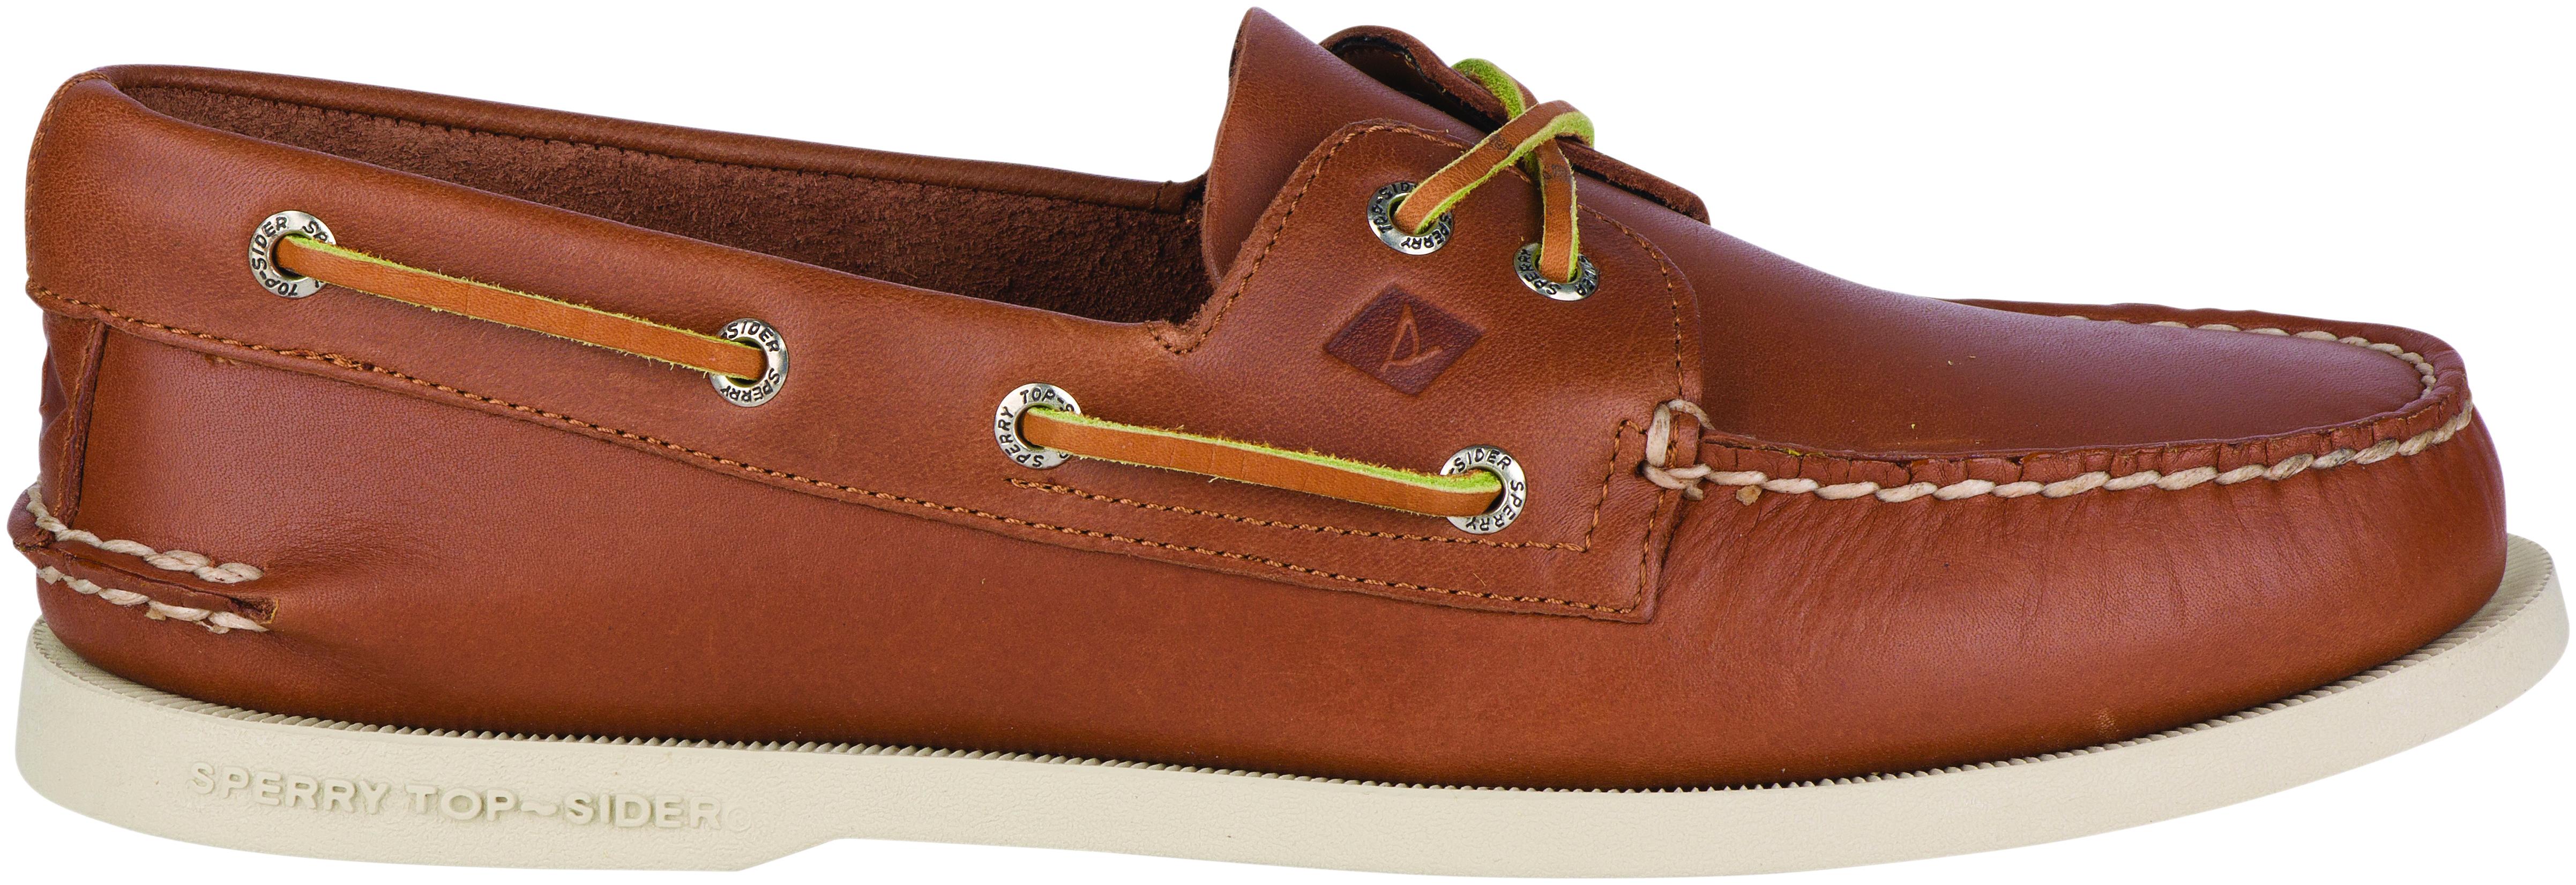 Sperry Men's A O 2-Eye Boat shoes in Tan